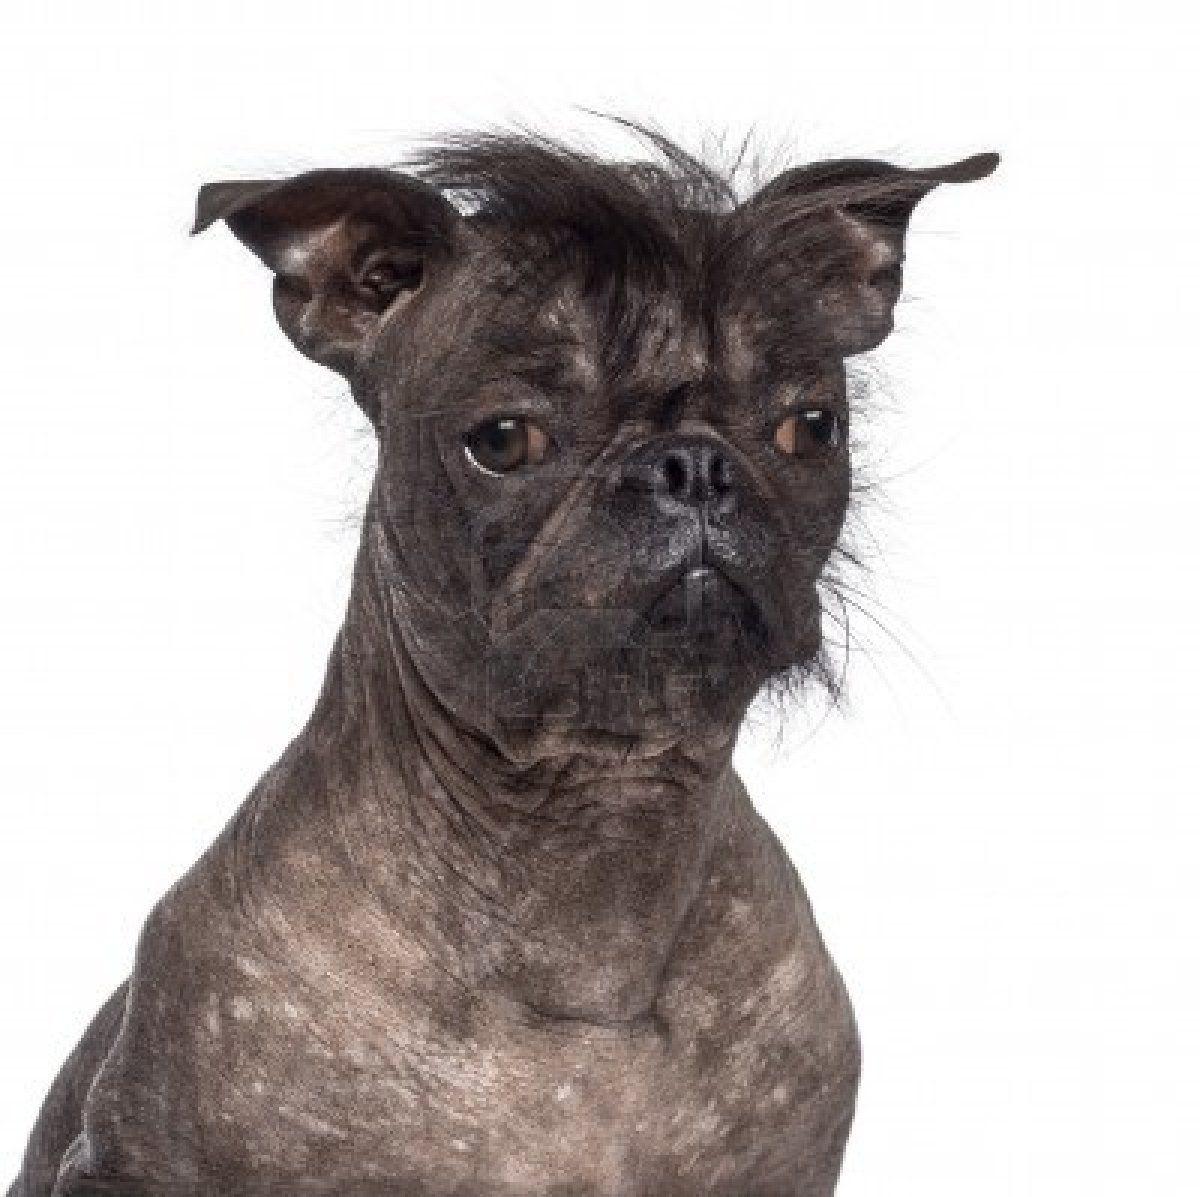 16773984 Hairless Dog Mix Between French Bulldog And Chinese